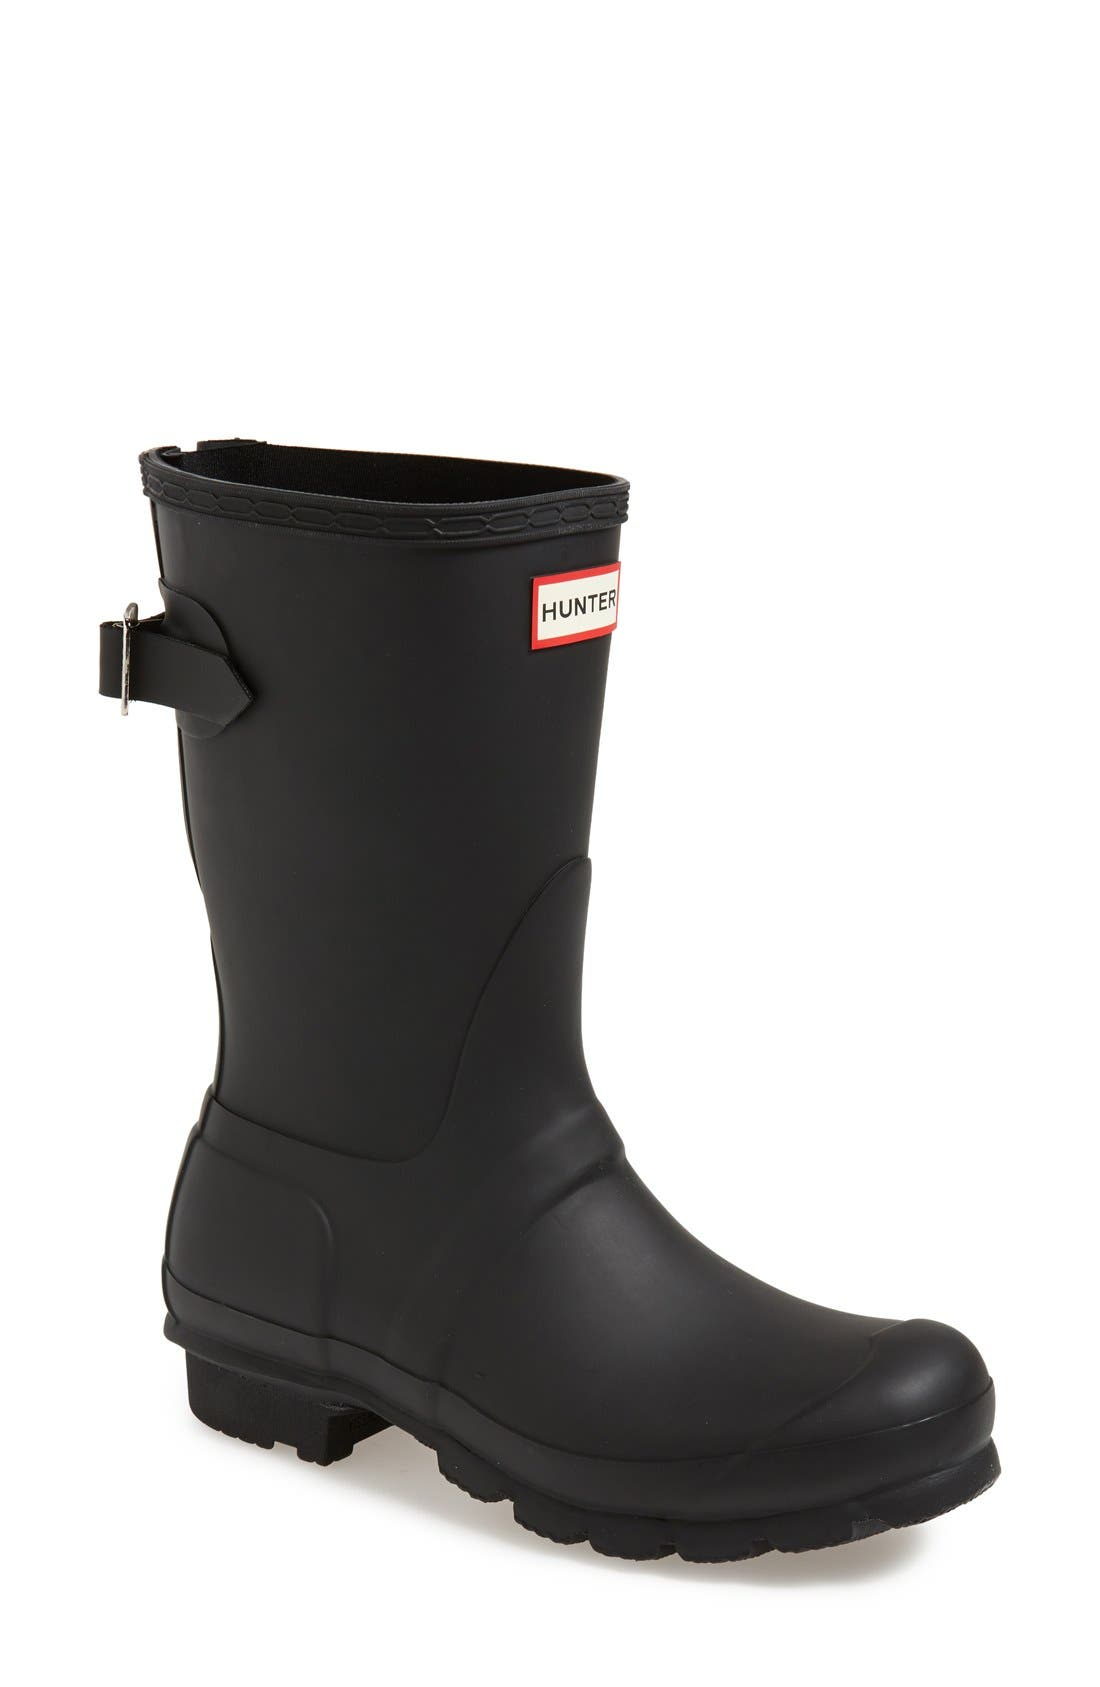 HUNTER, Original Short Back Adjustable Waterproof Rain Boot, Main thumbnail 1, color, BLACK